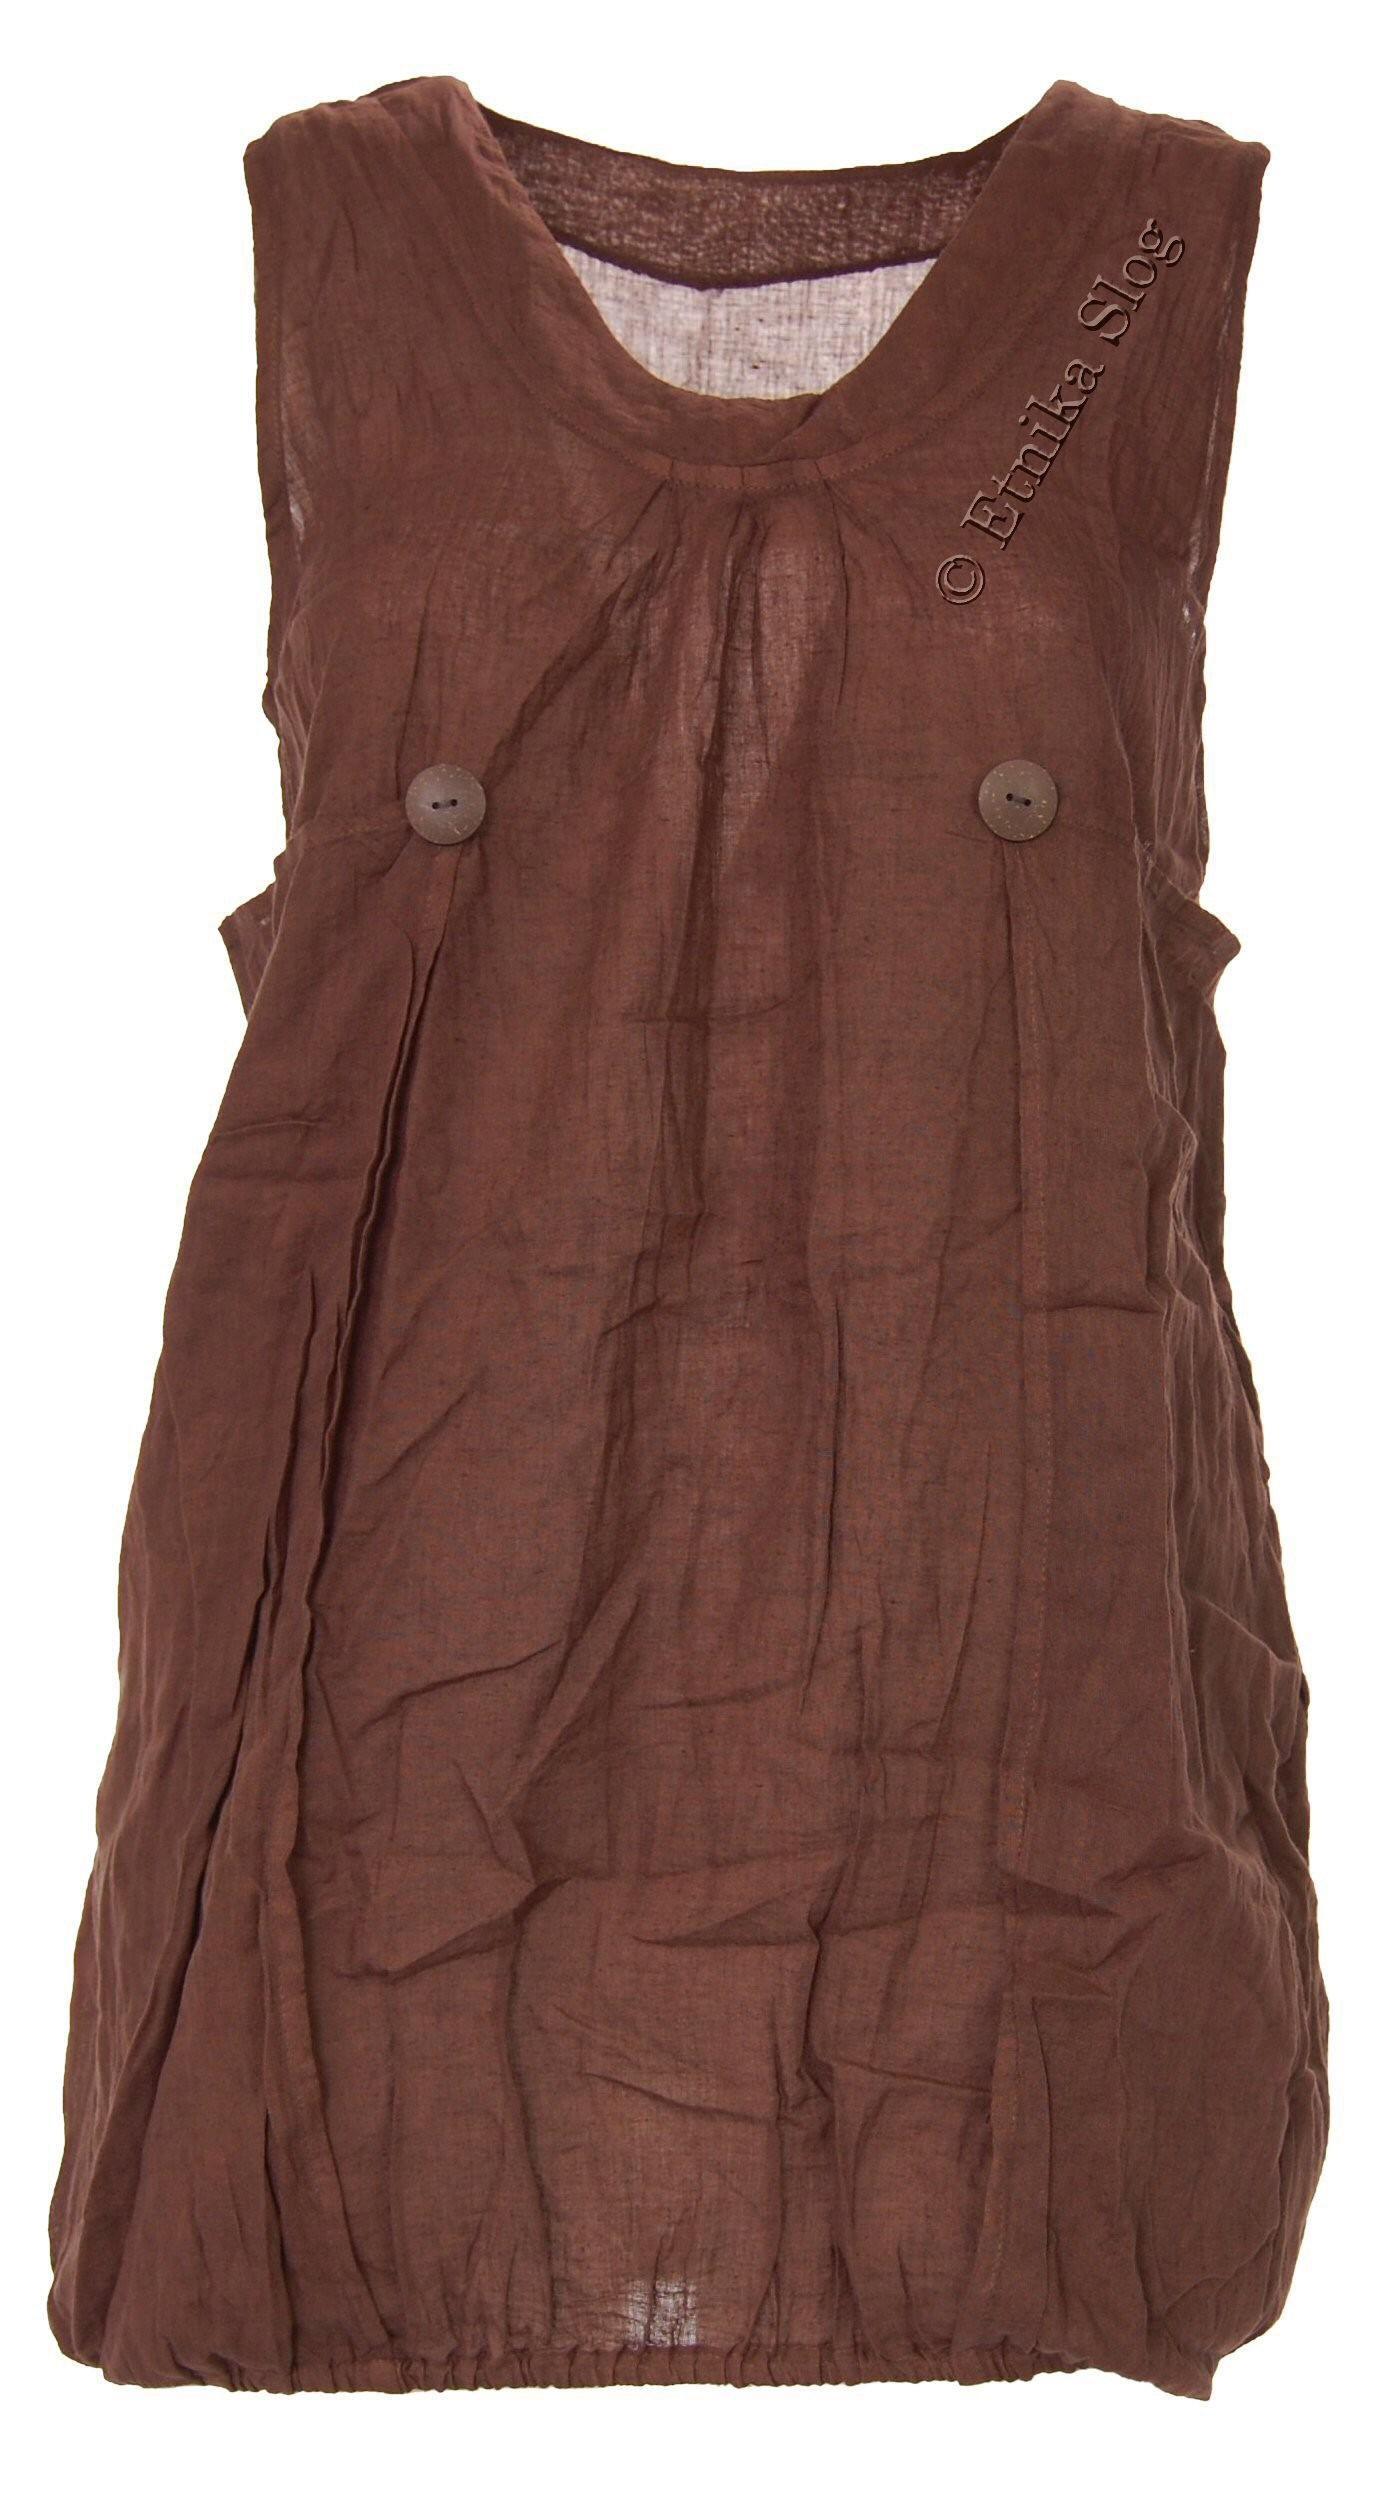 SHORT SLEEVE AND SLEEVELESS COTTON DRESSES AB-AJV10 - Oriente Import S.r.l.